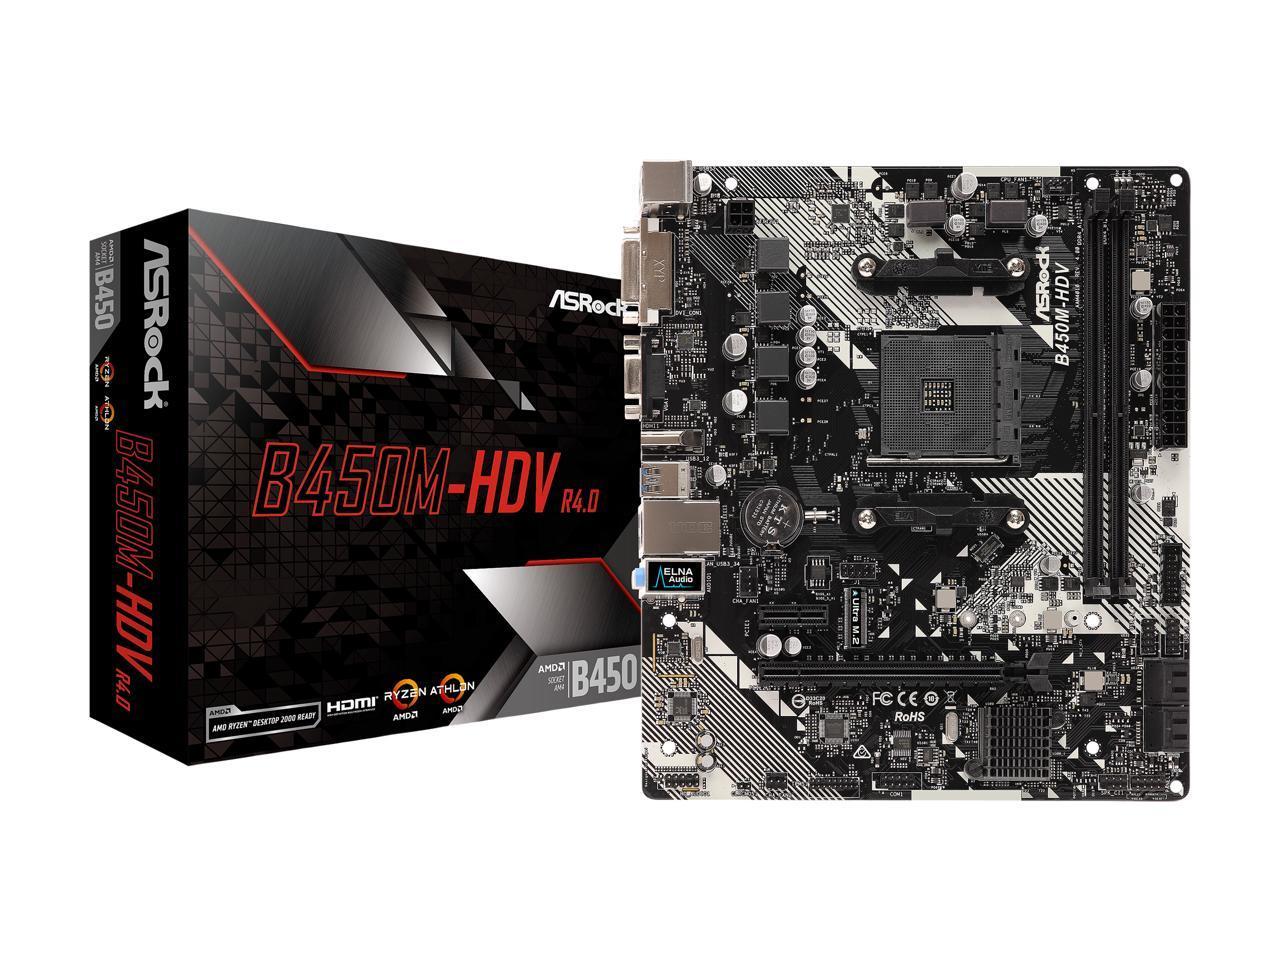 Details about ASRock B450M-HDV R4 0 AM4 AMD Promontory B450 SATA 6Gb/s  Micro ATX AMD Motherboa